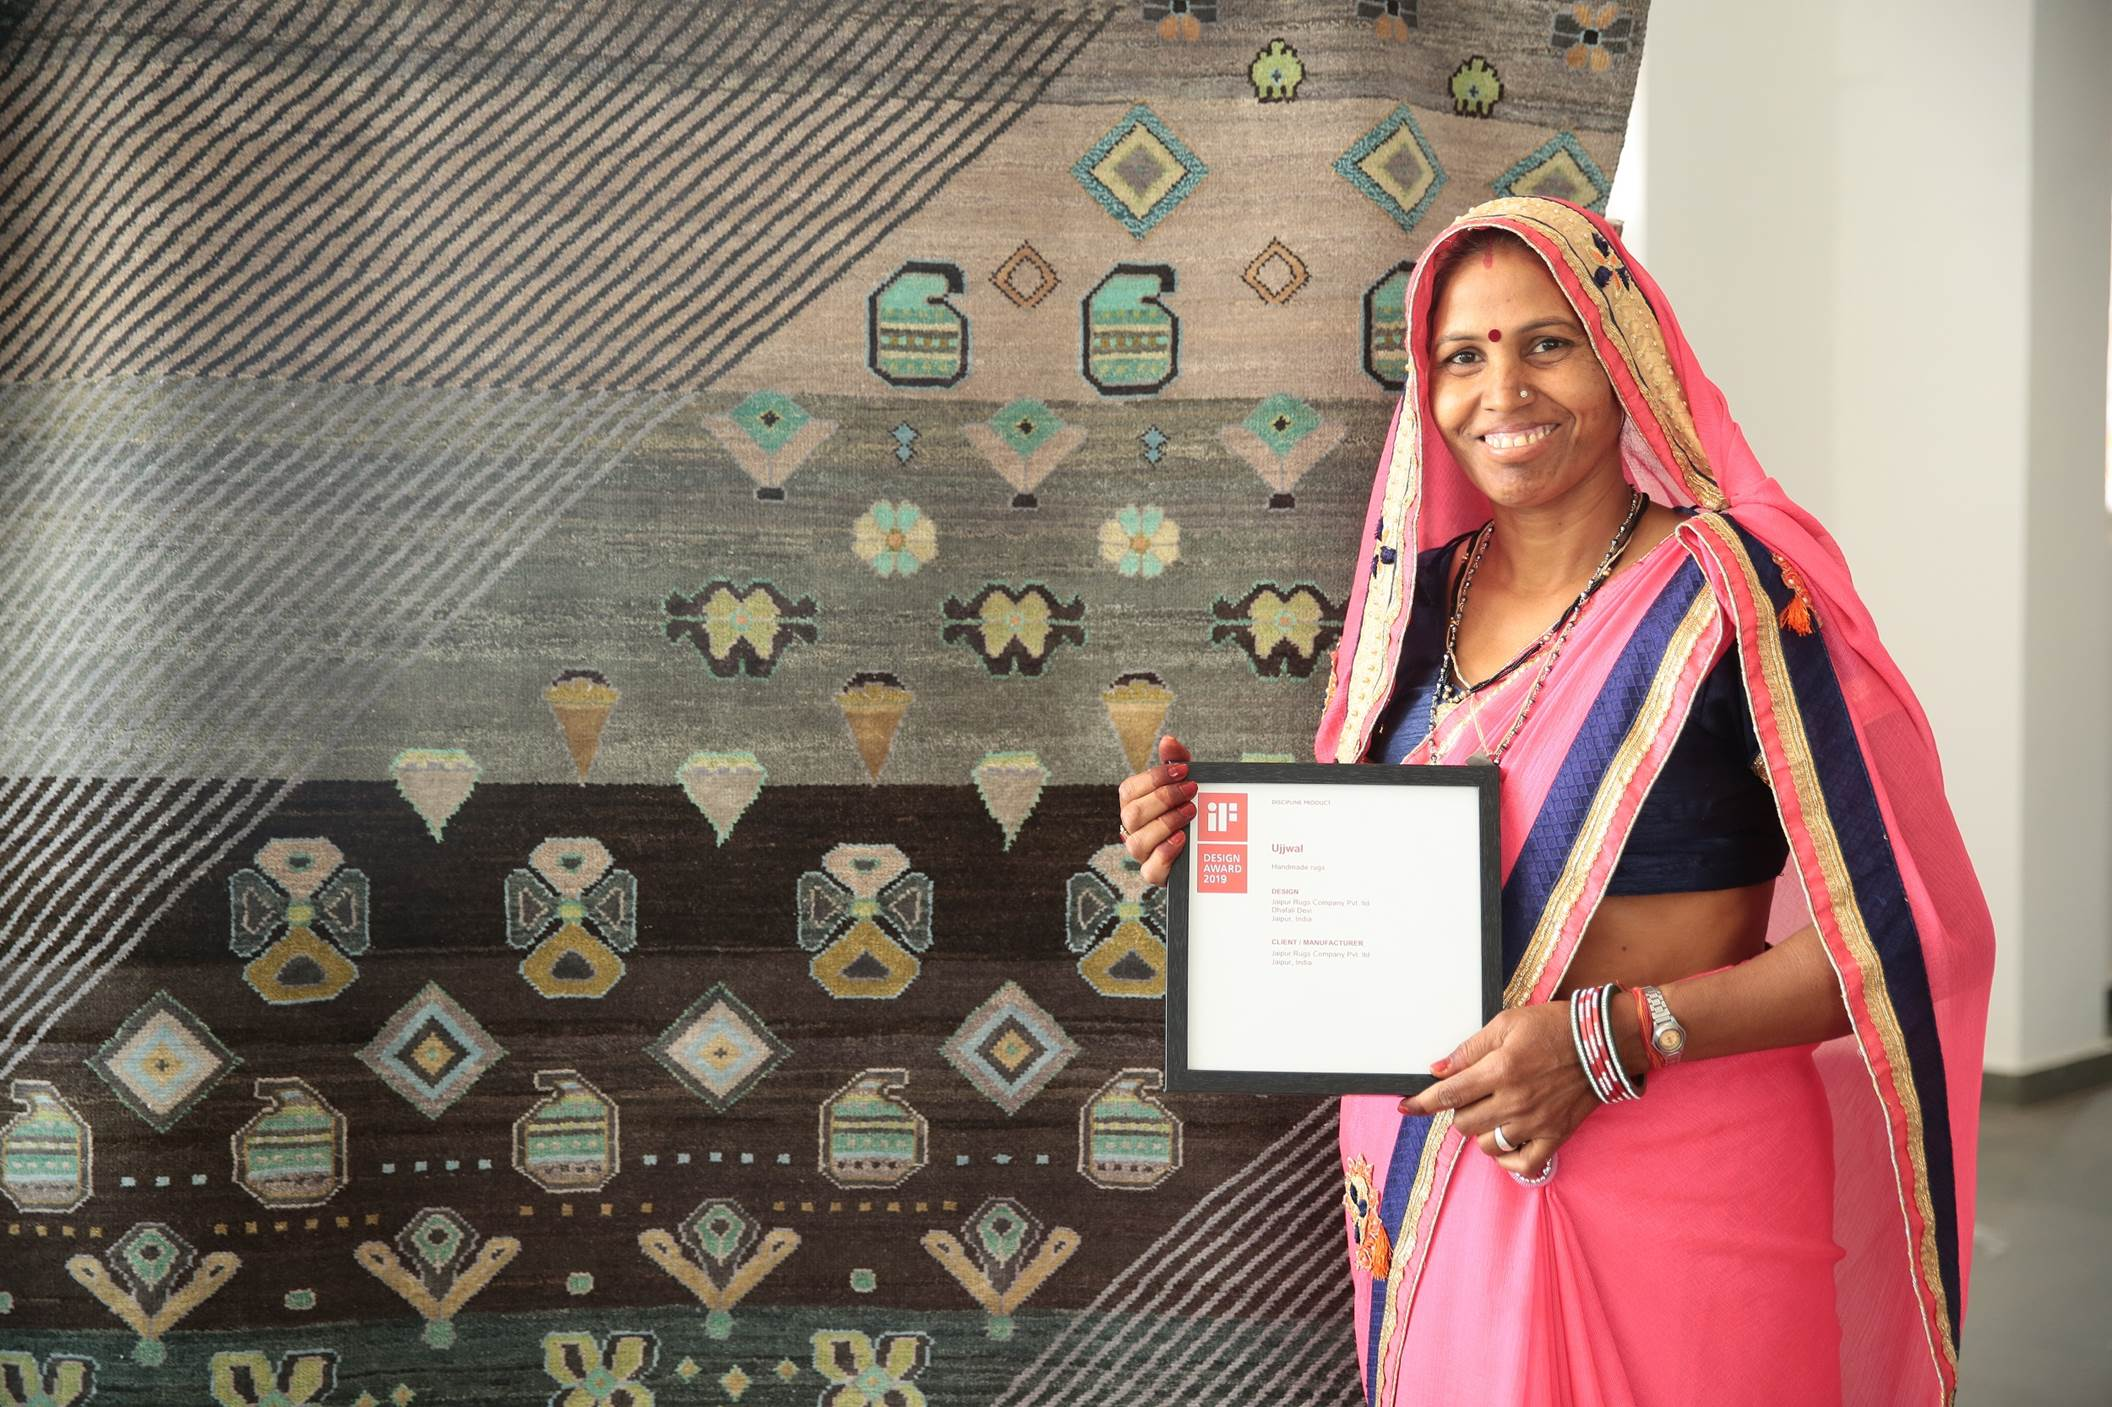 IF award